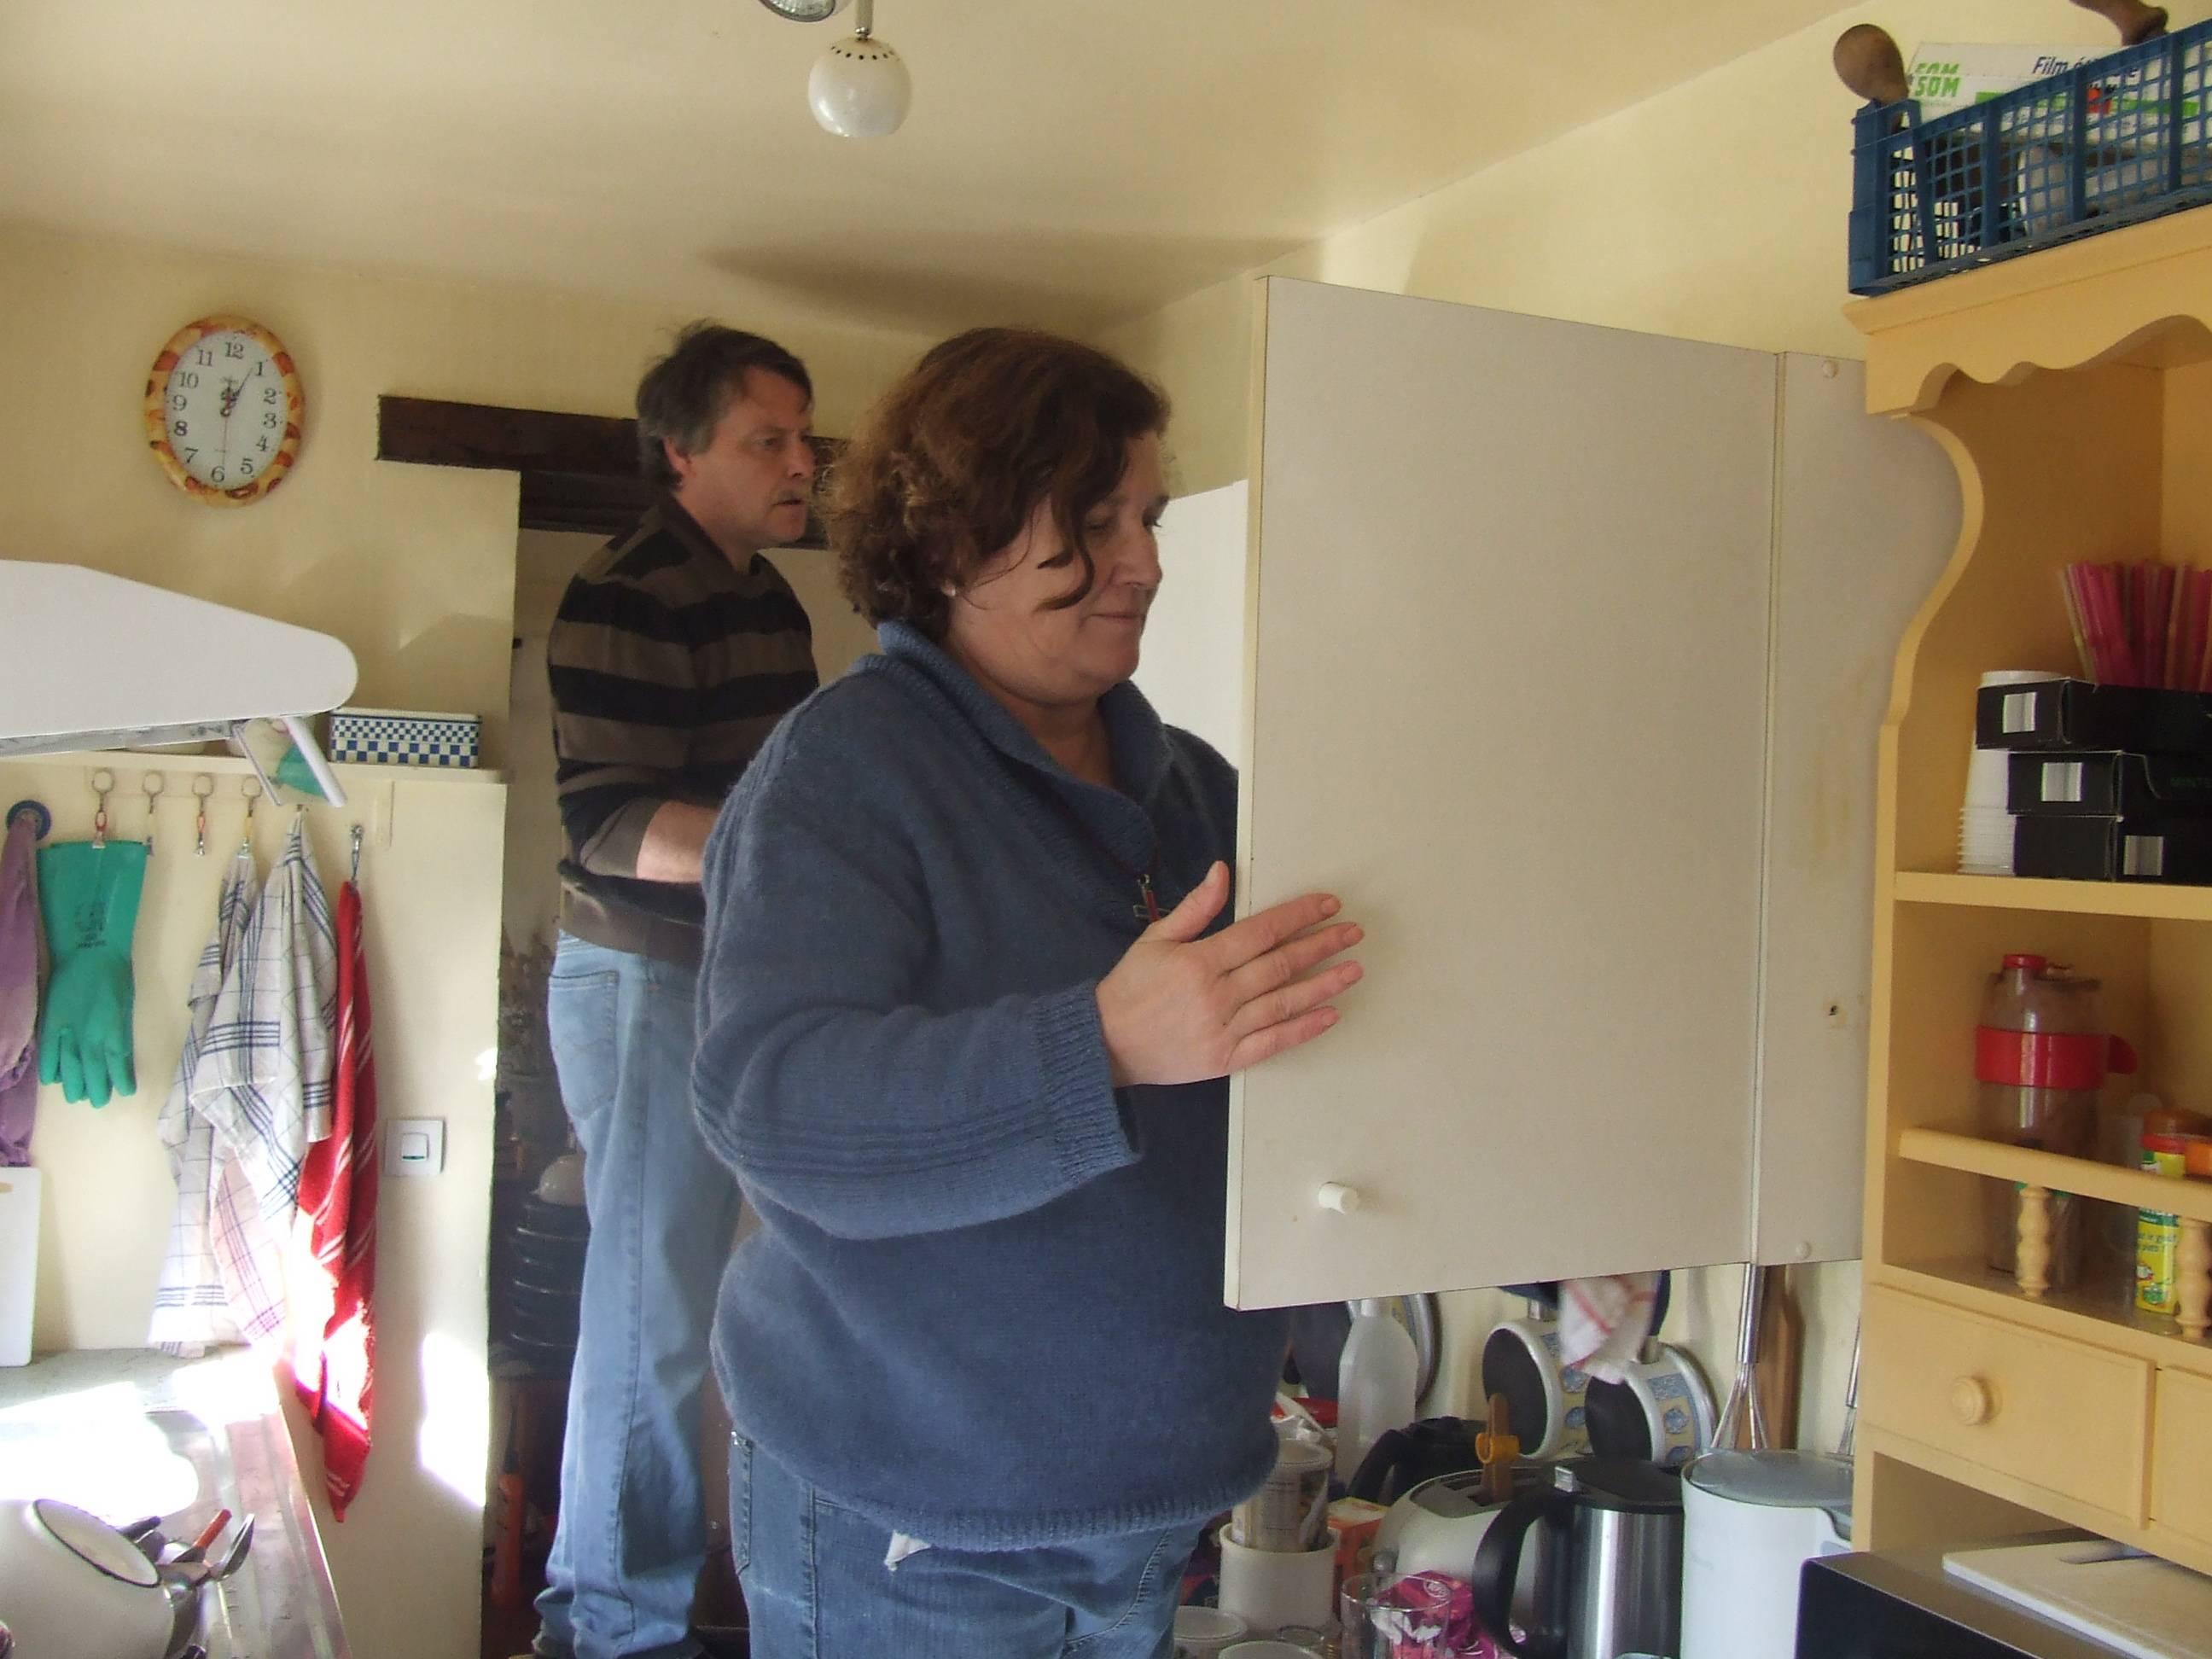 travaux ménagers